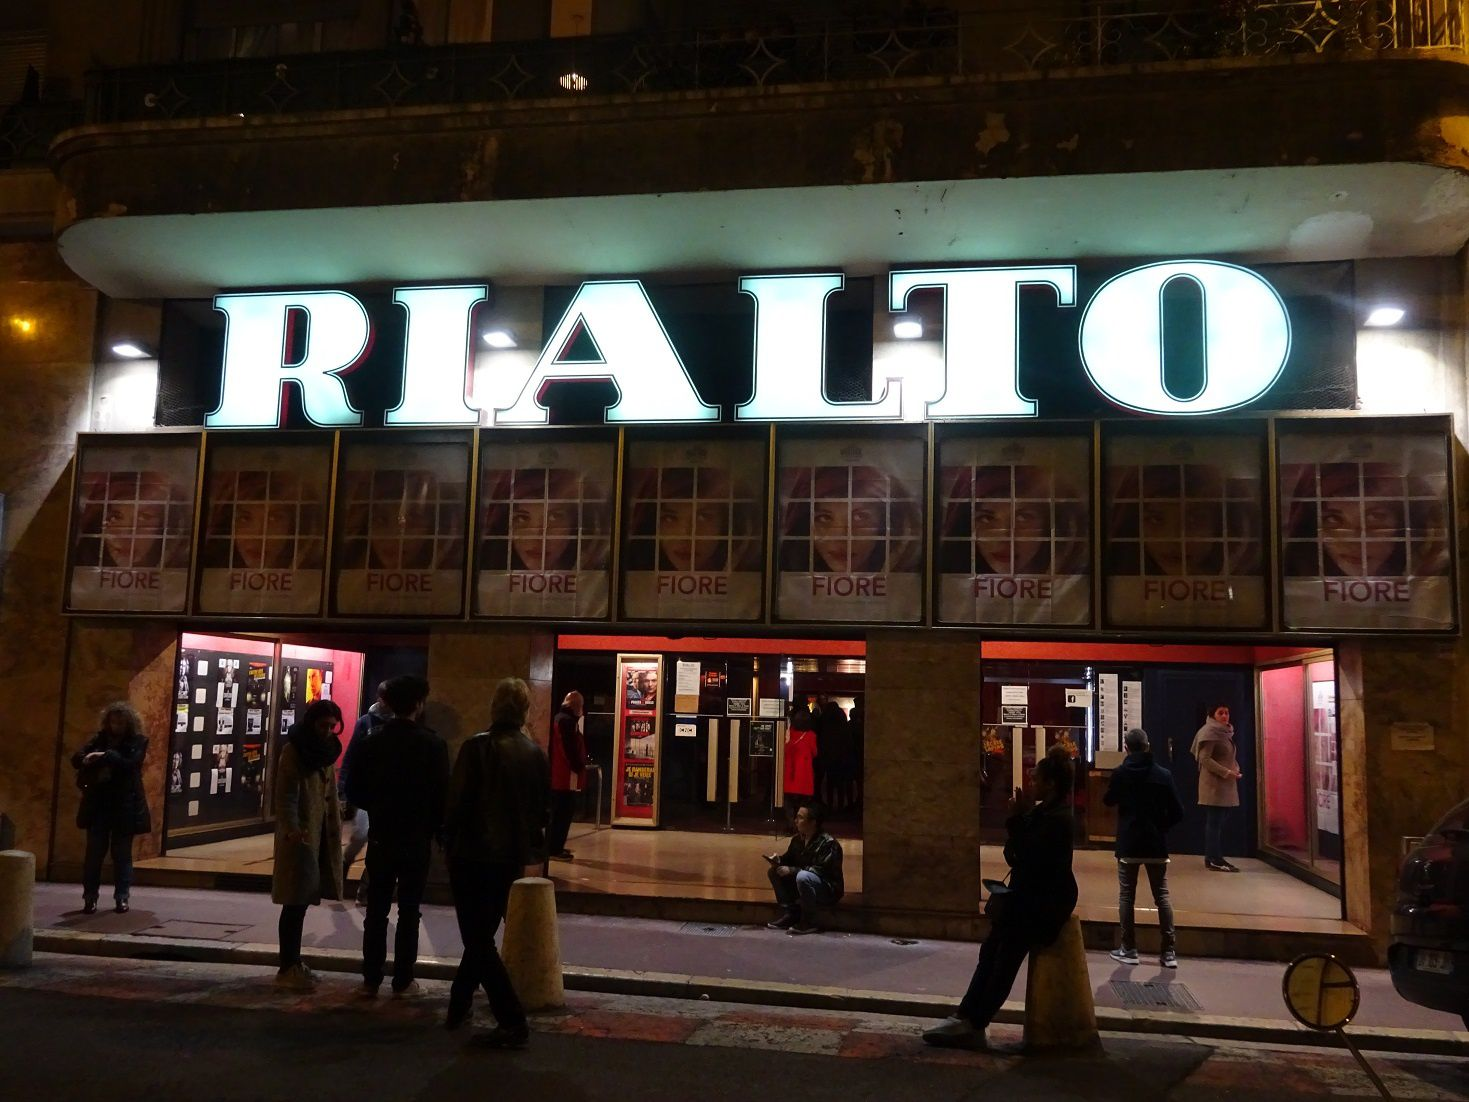 """Rialto"" de Claudio Giovannesi - Cinéma Rialto ©Théodore Charles/un-culte-d-art.overblog.com"